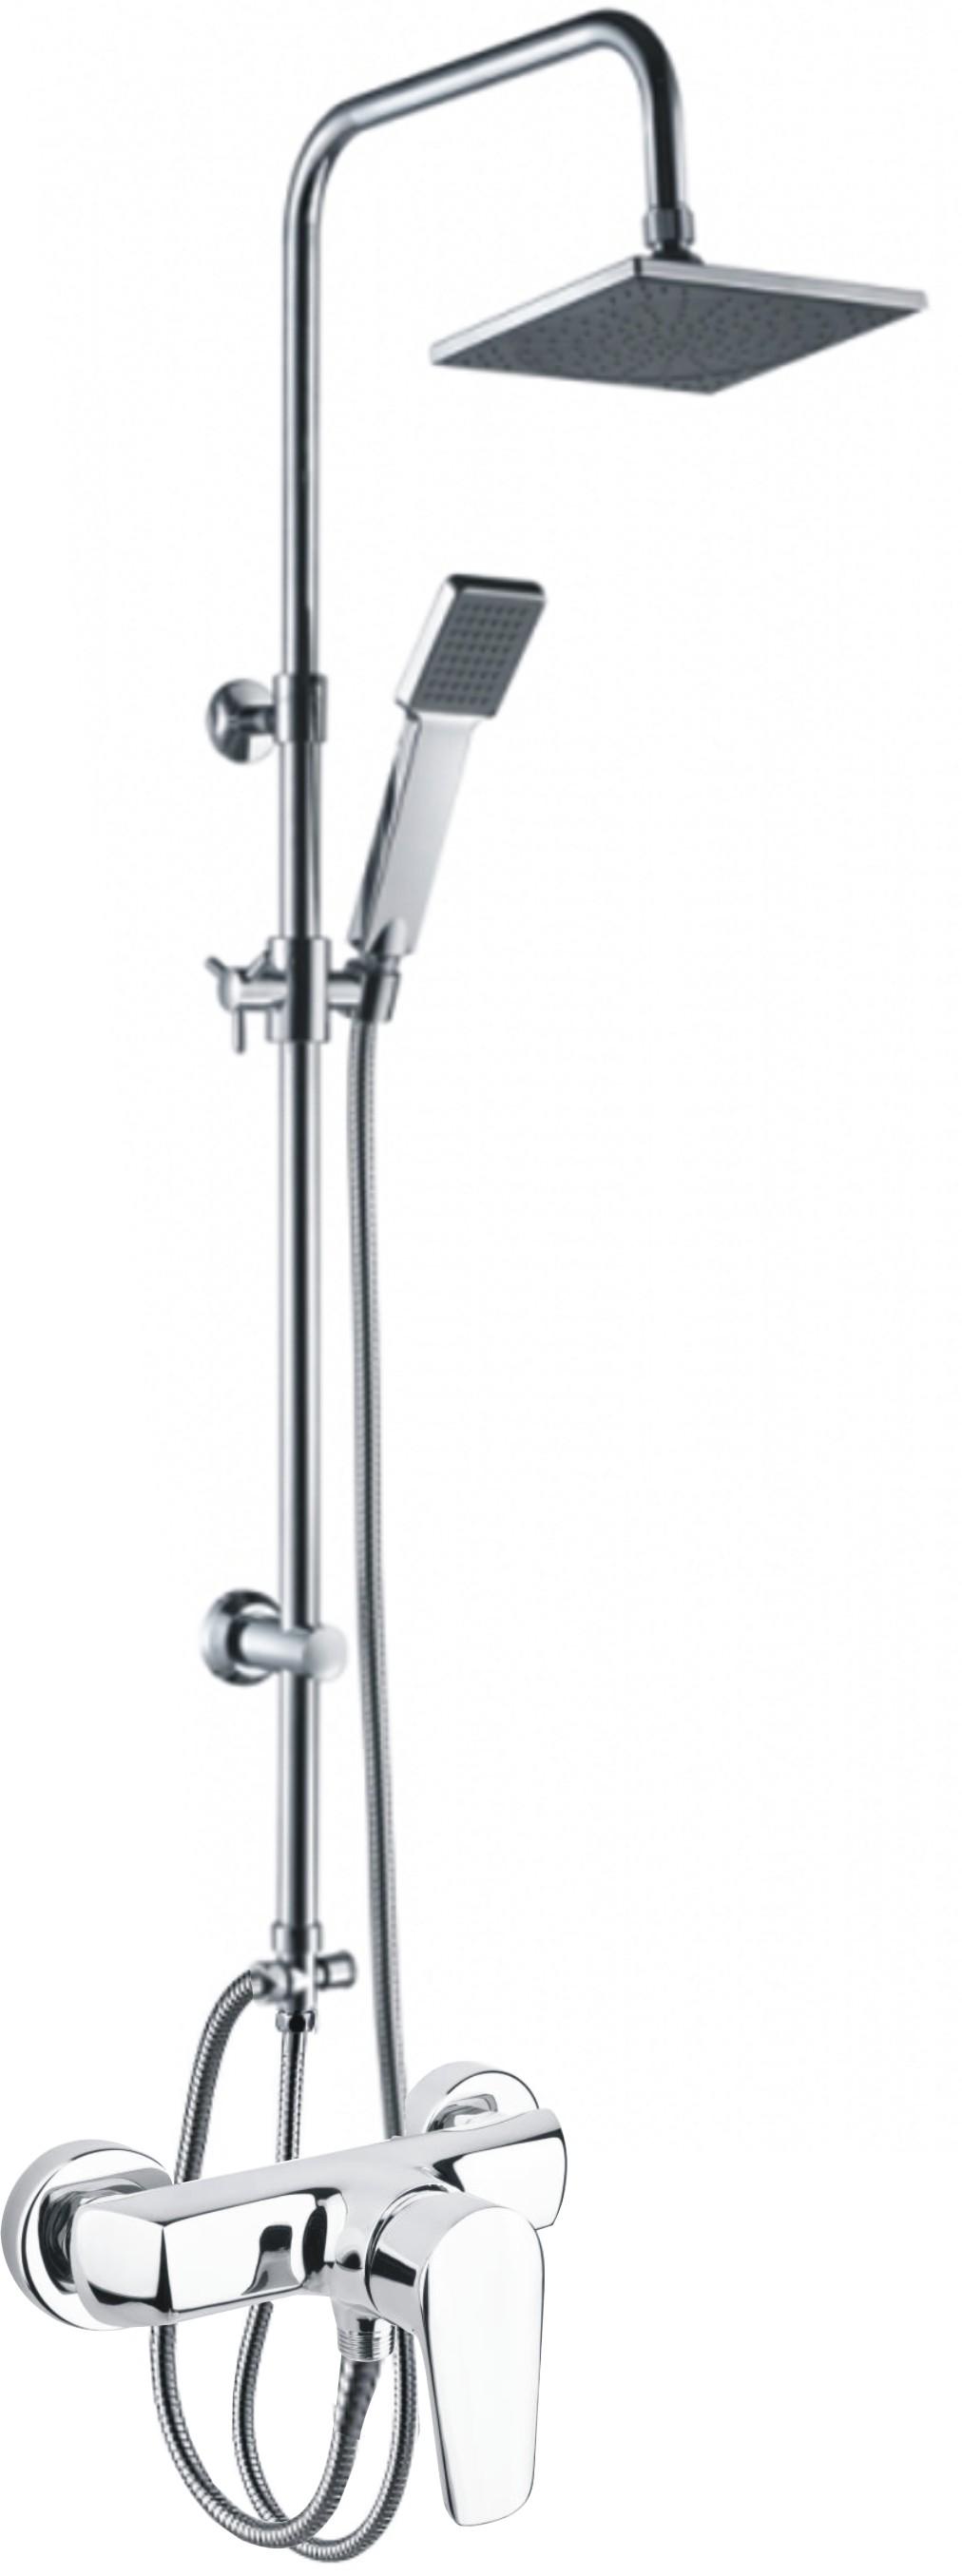 RELAX RAPID 4 Well Sprchový set se sprchovou baterií, skladem